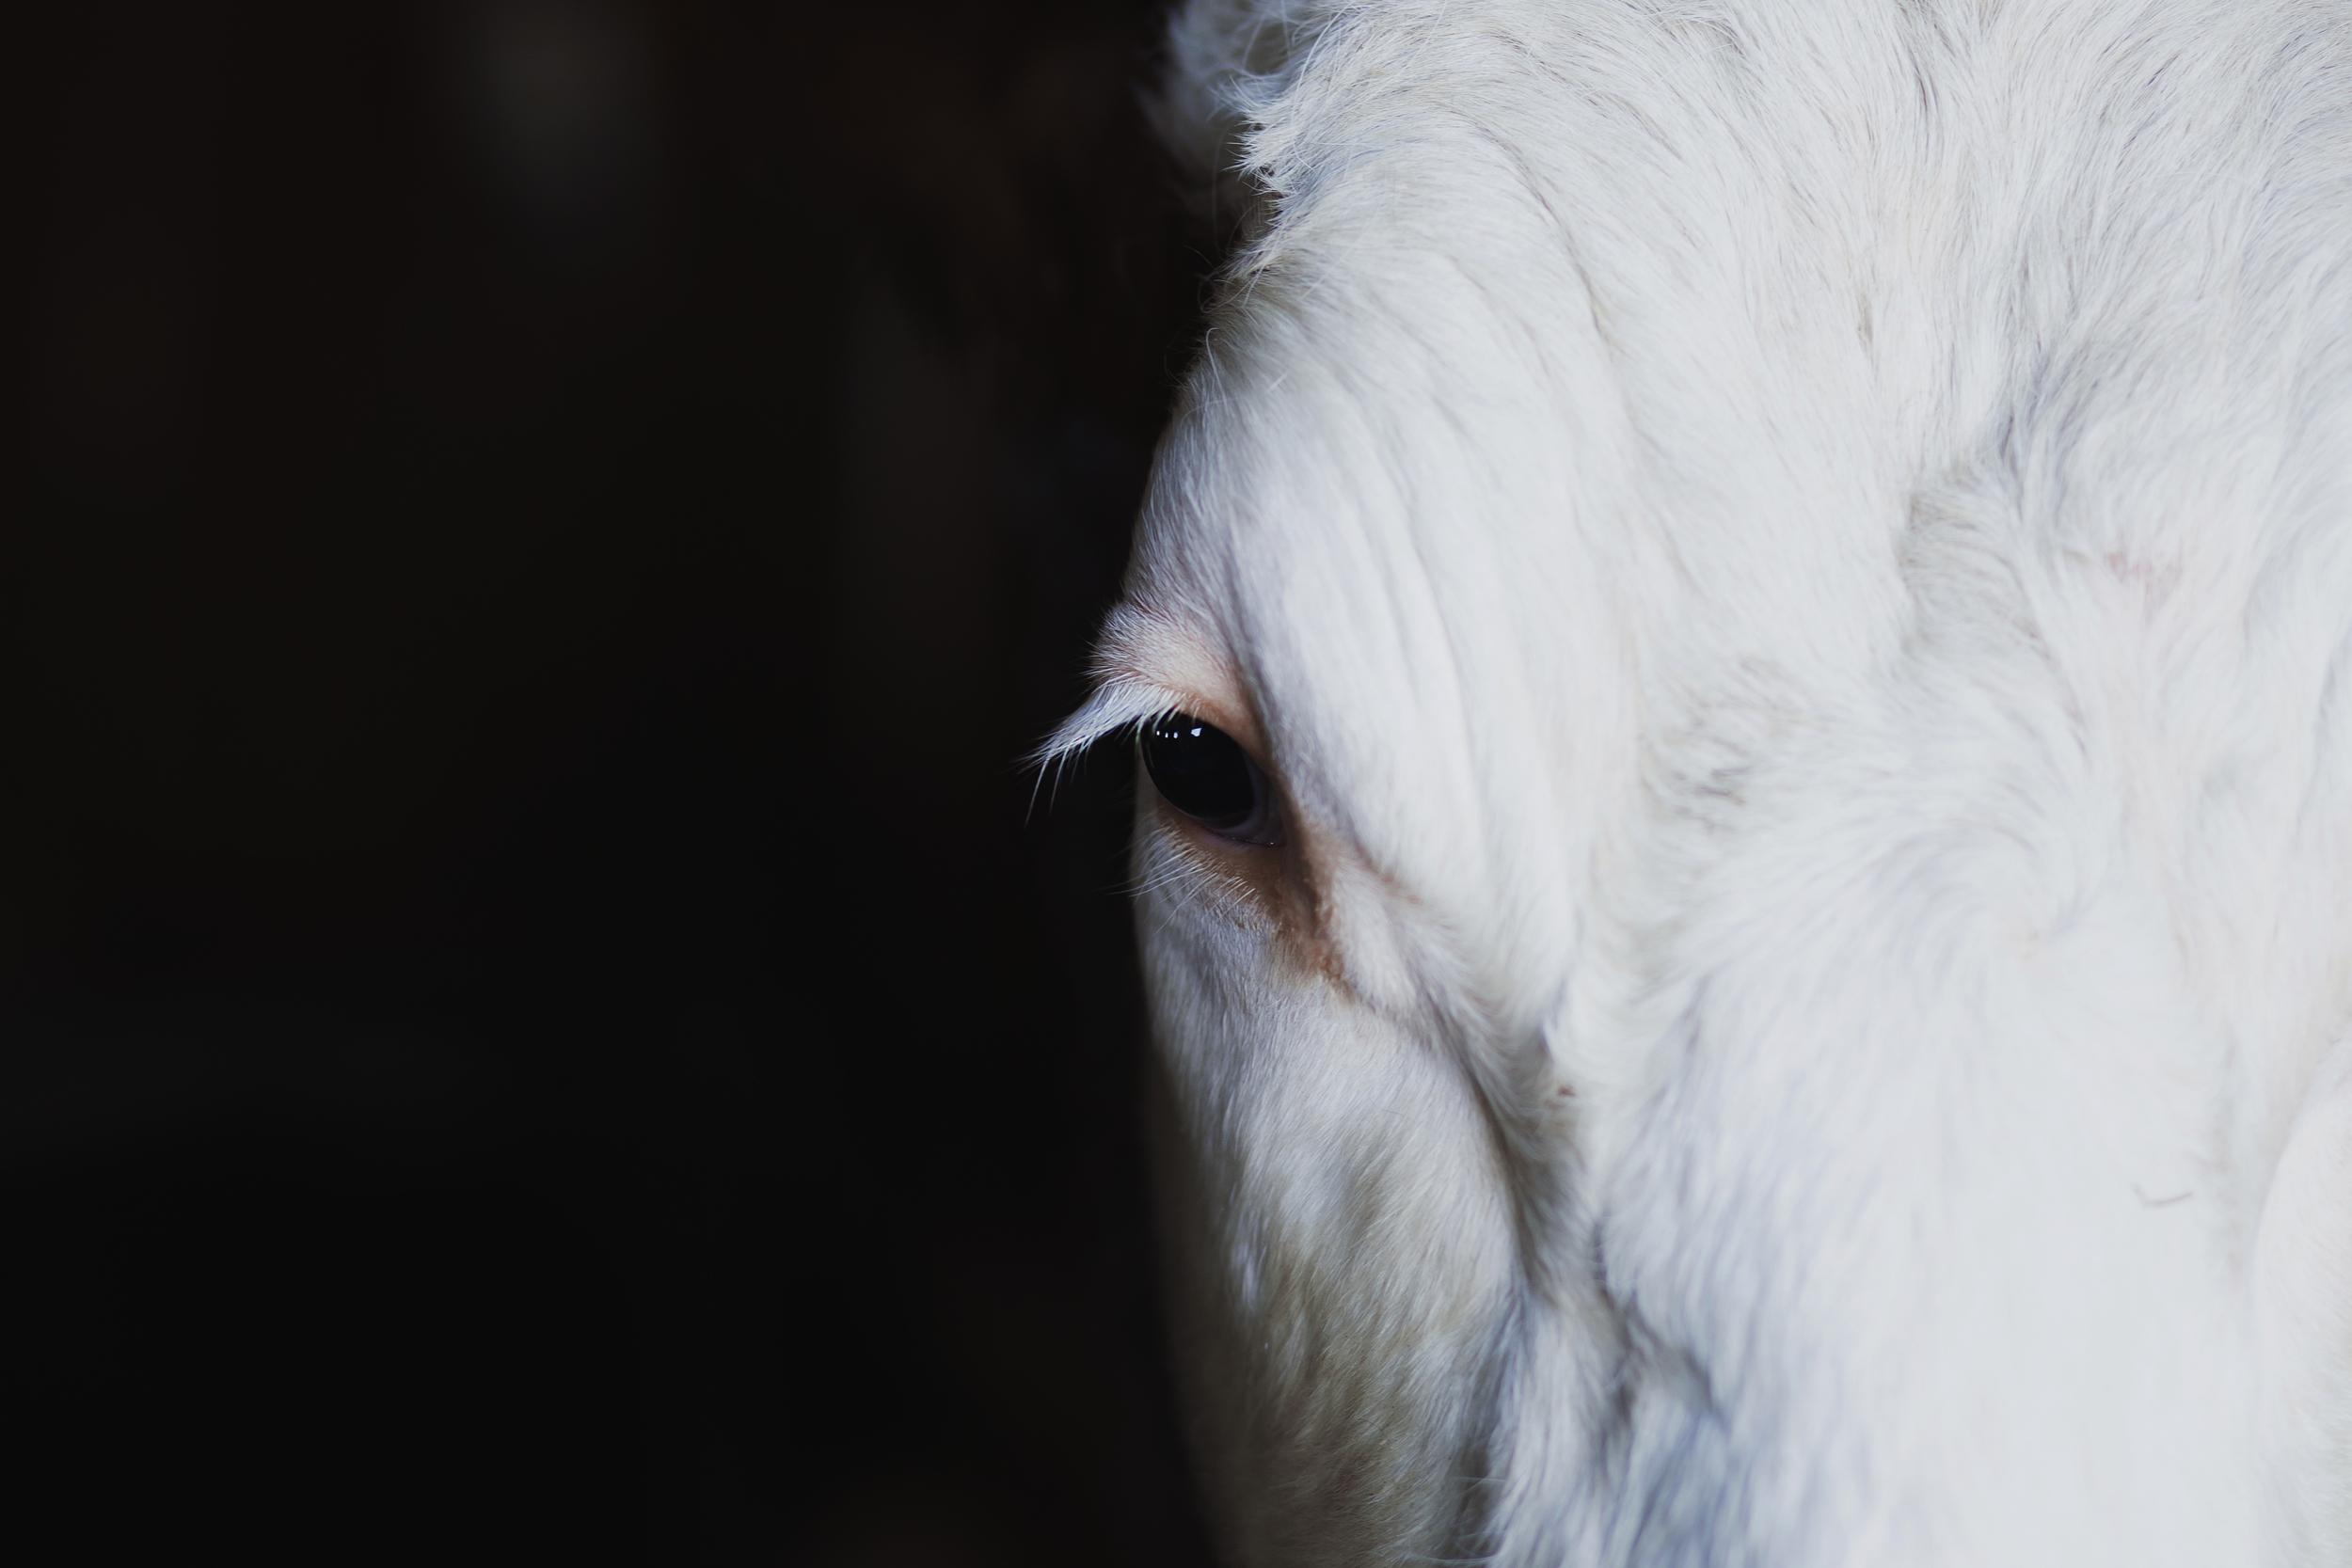 cow_eye_color.jpg